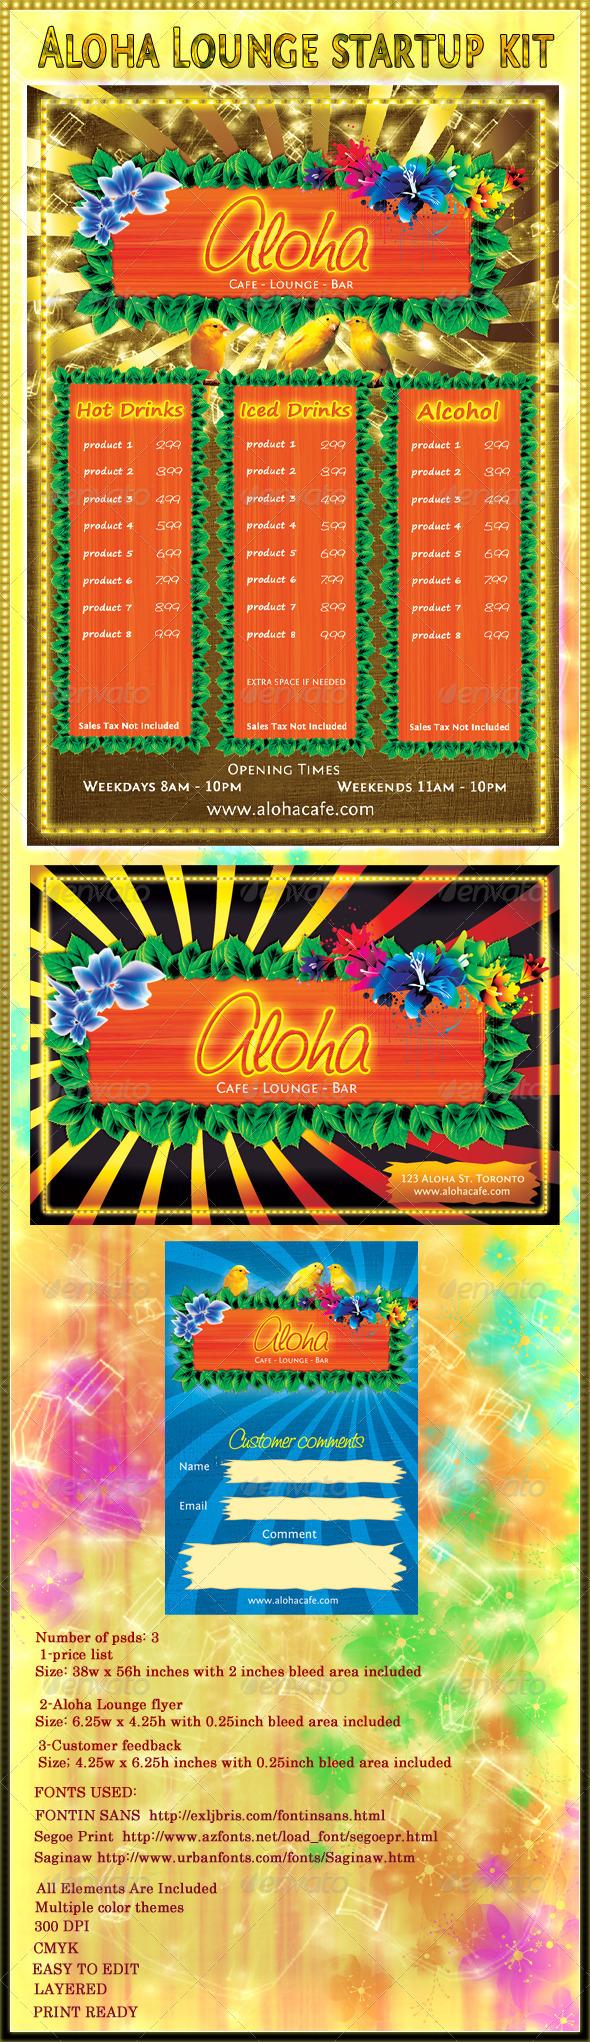 Aloha Lounge Startup kit